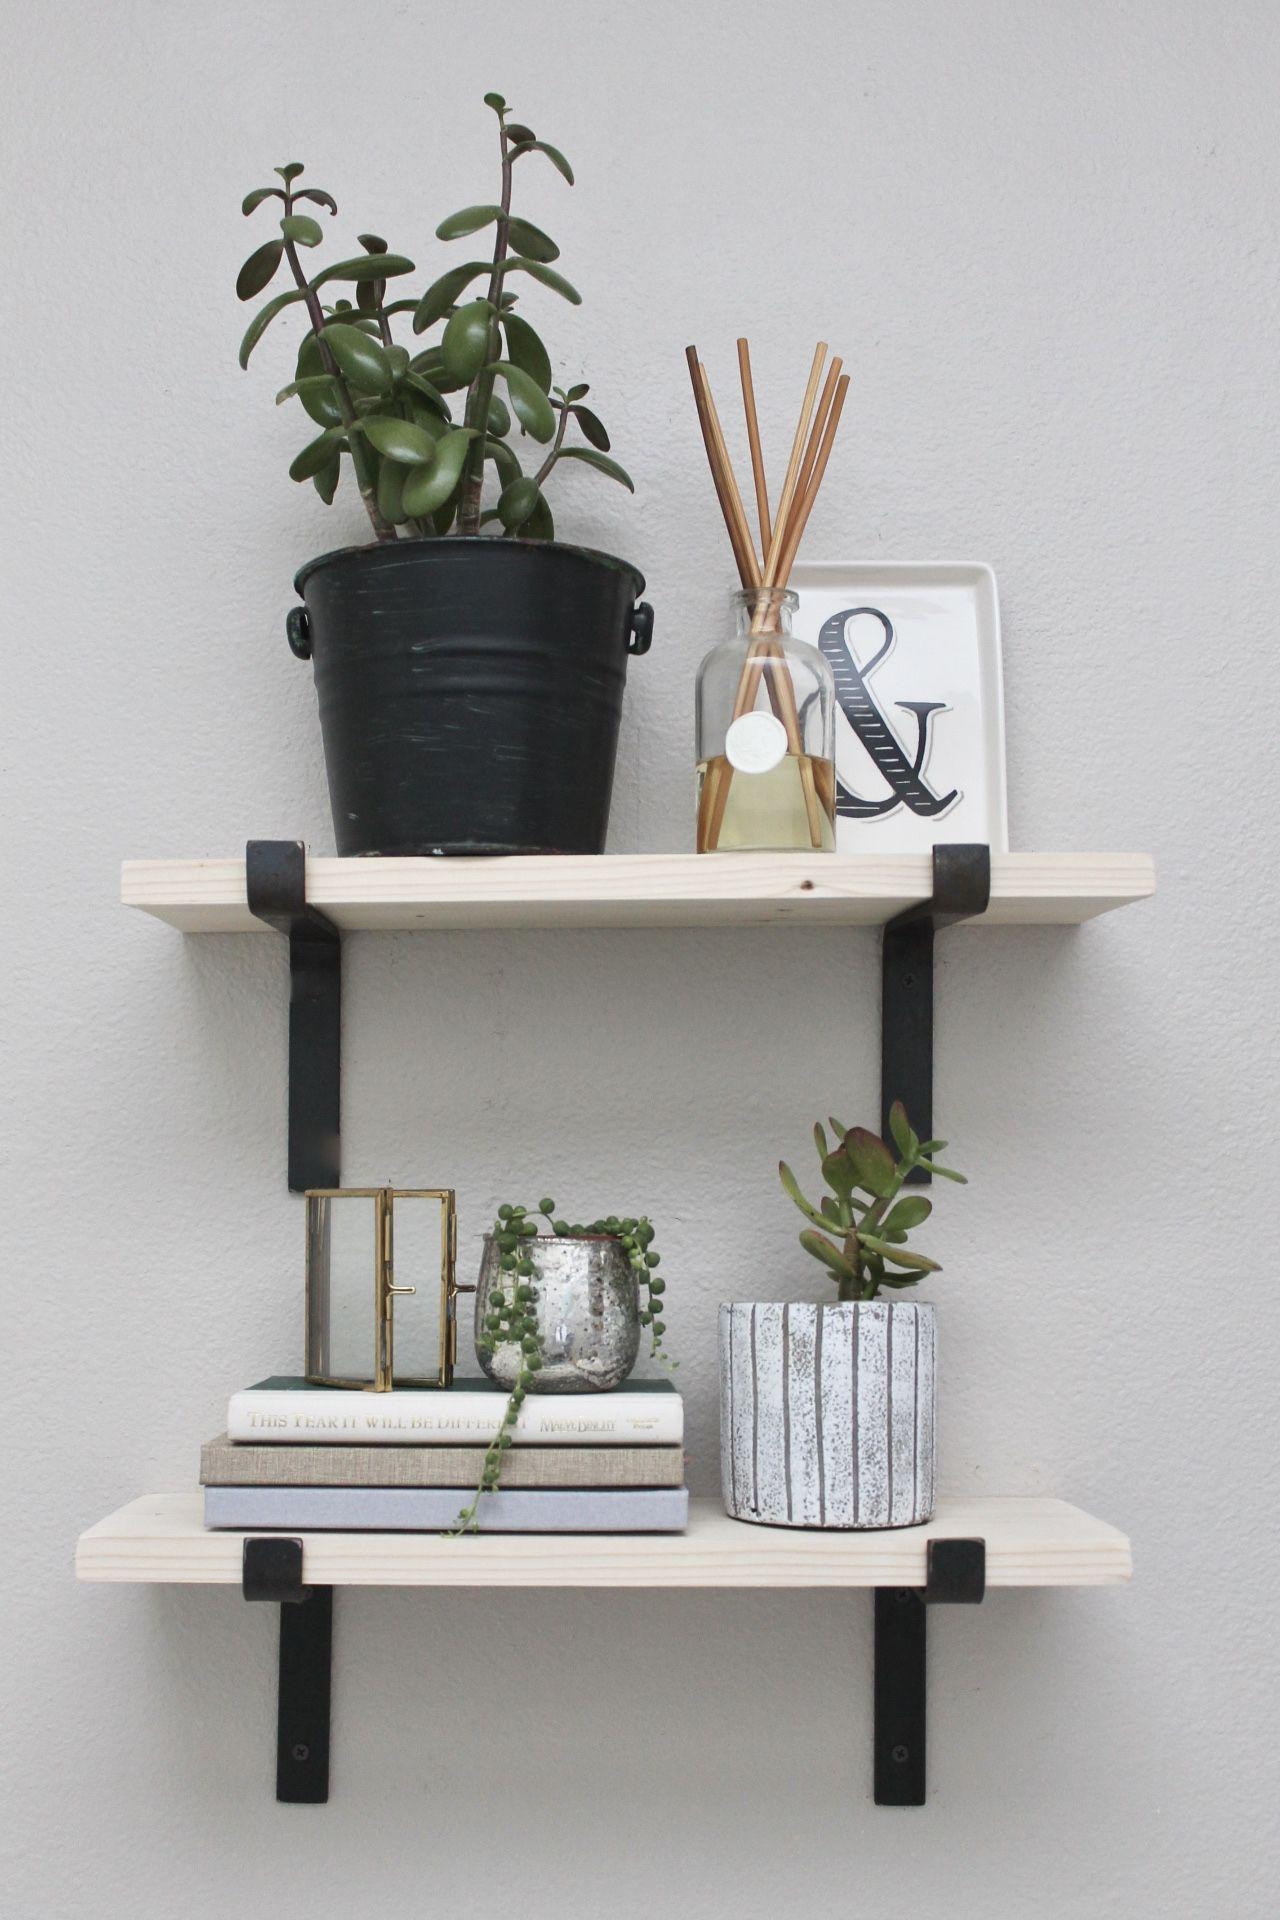 5 Tried & True Shelf Styling Tips Modern farmhouse decor